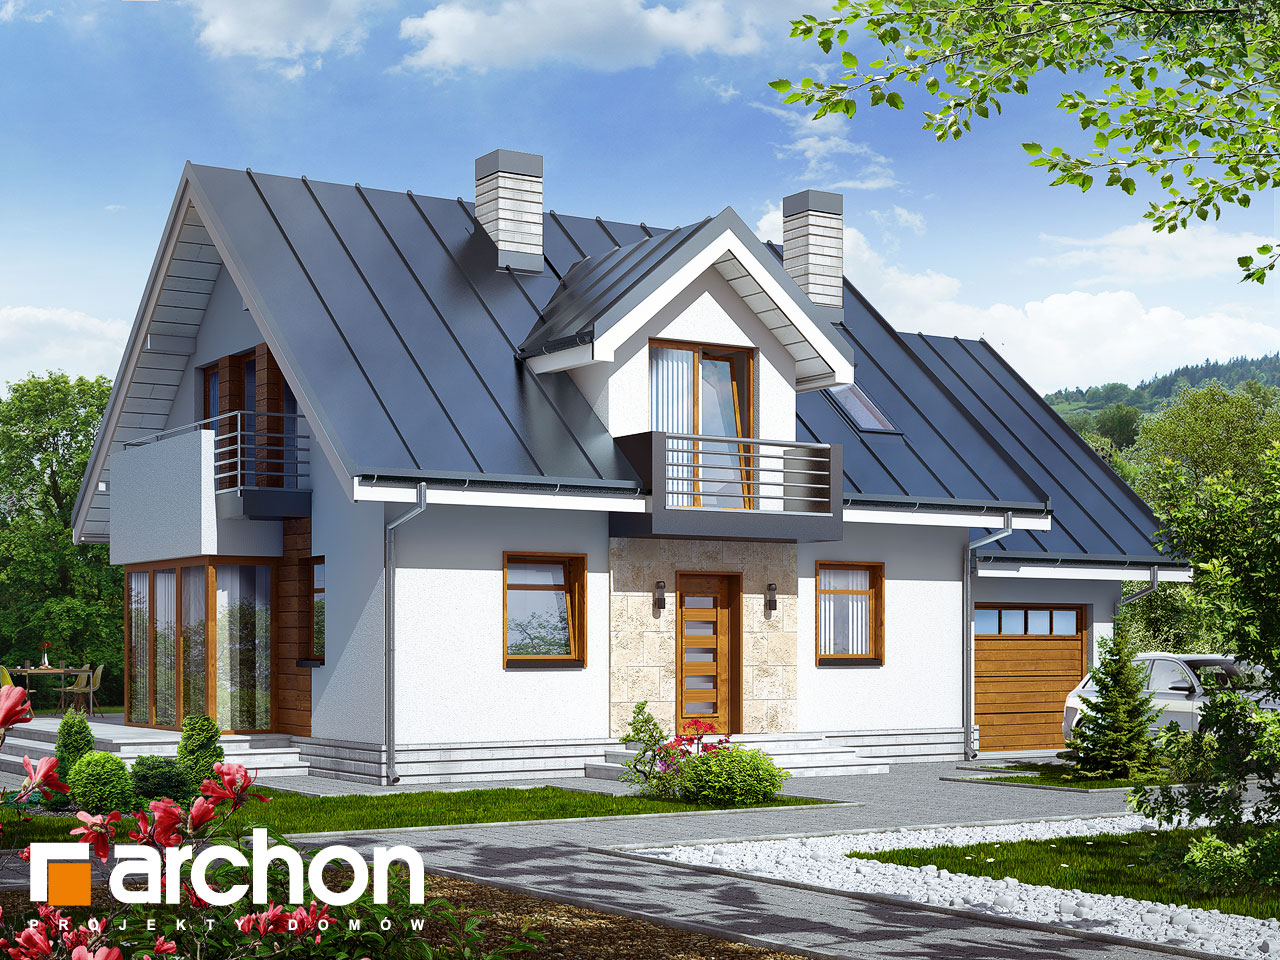 projekt domu dom w rododendronach 6 n archon. Black Bedroom Furniture Sets. Home Design Ideas